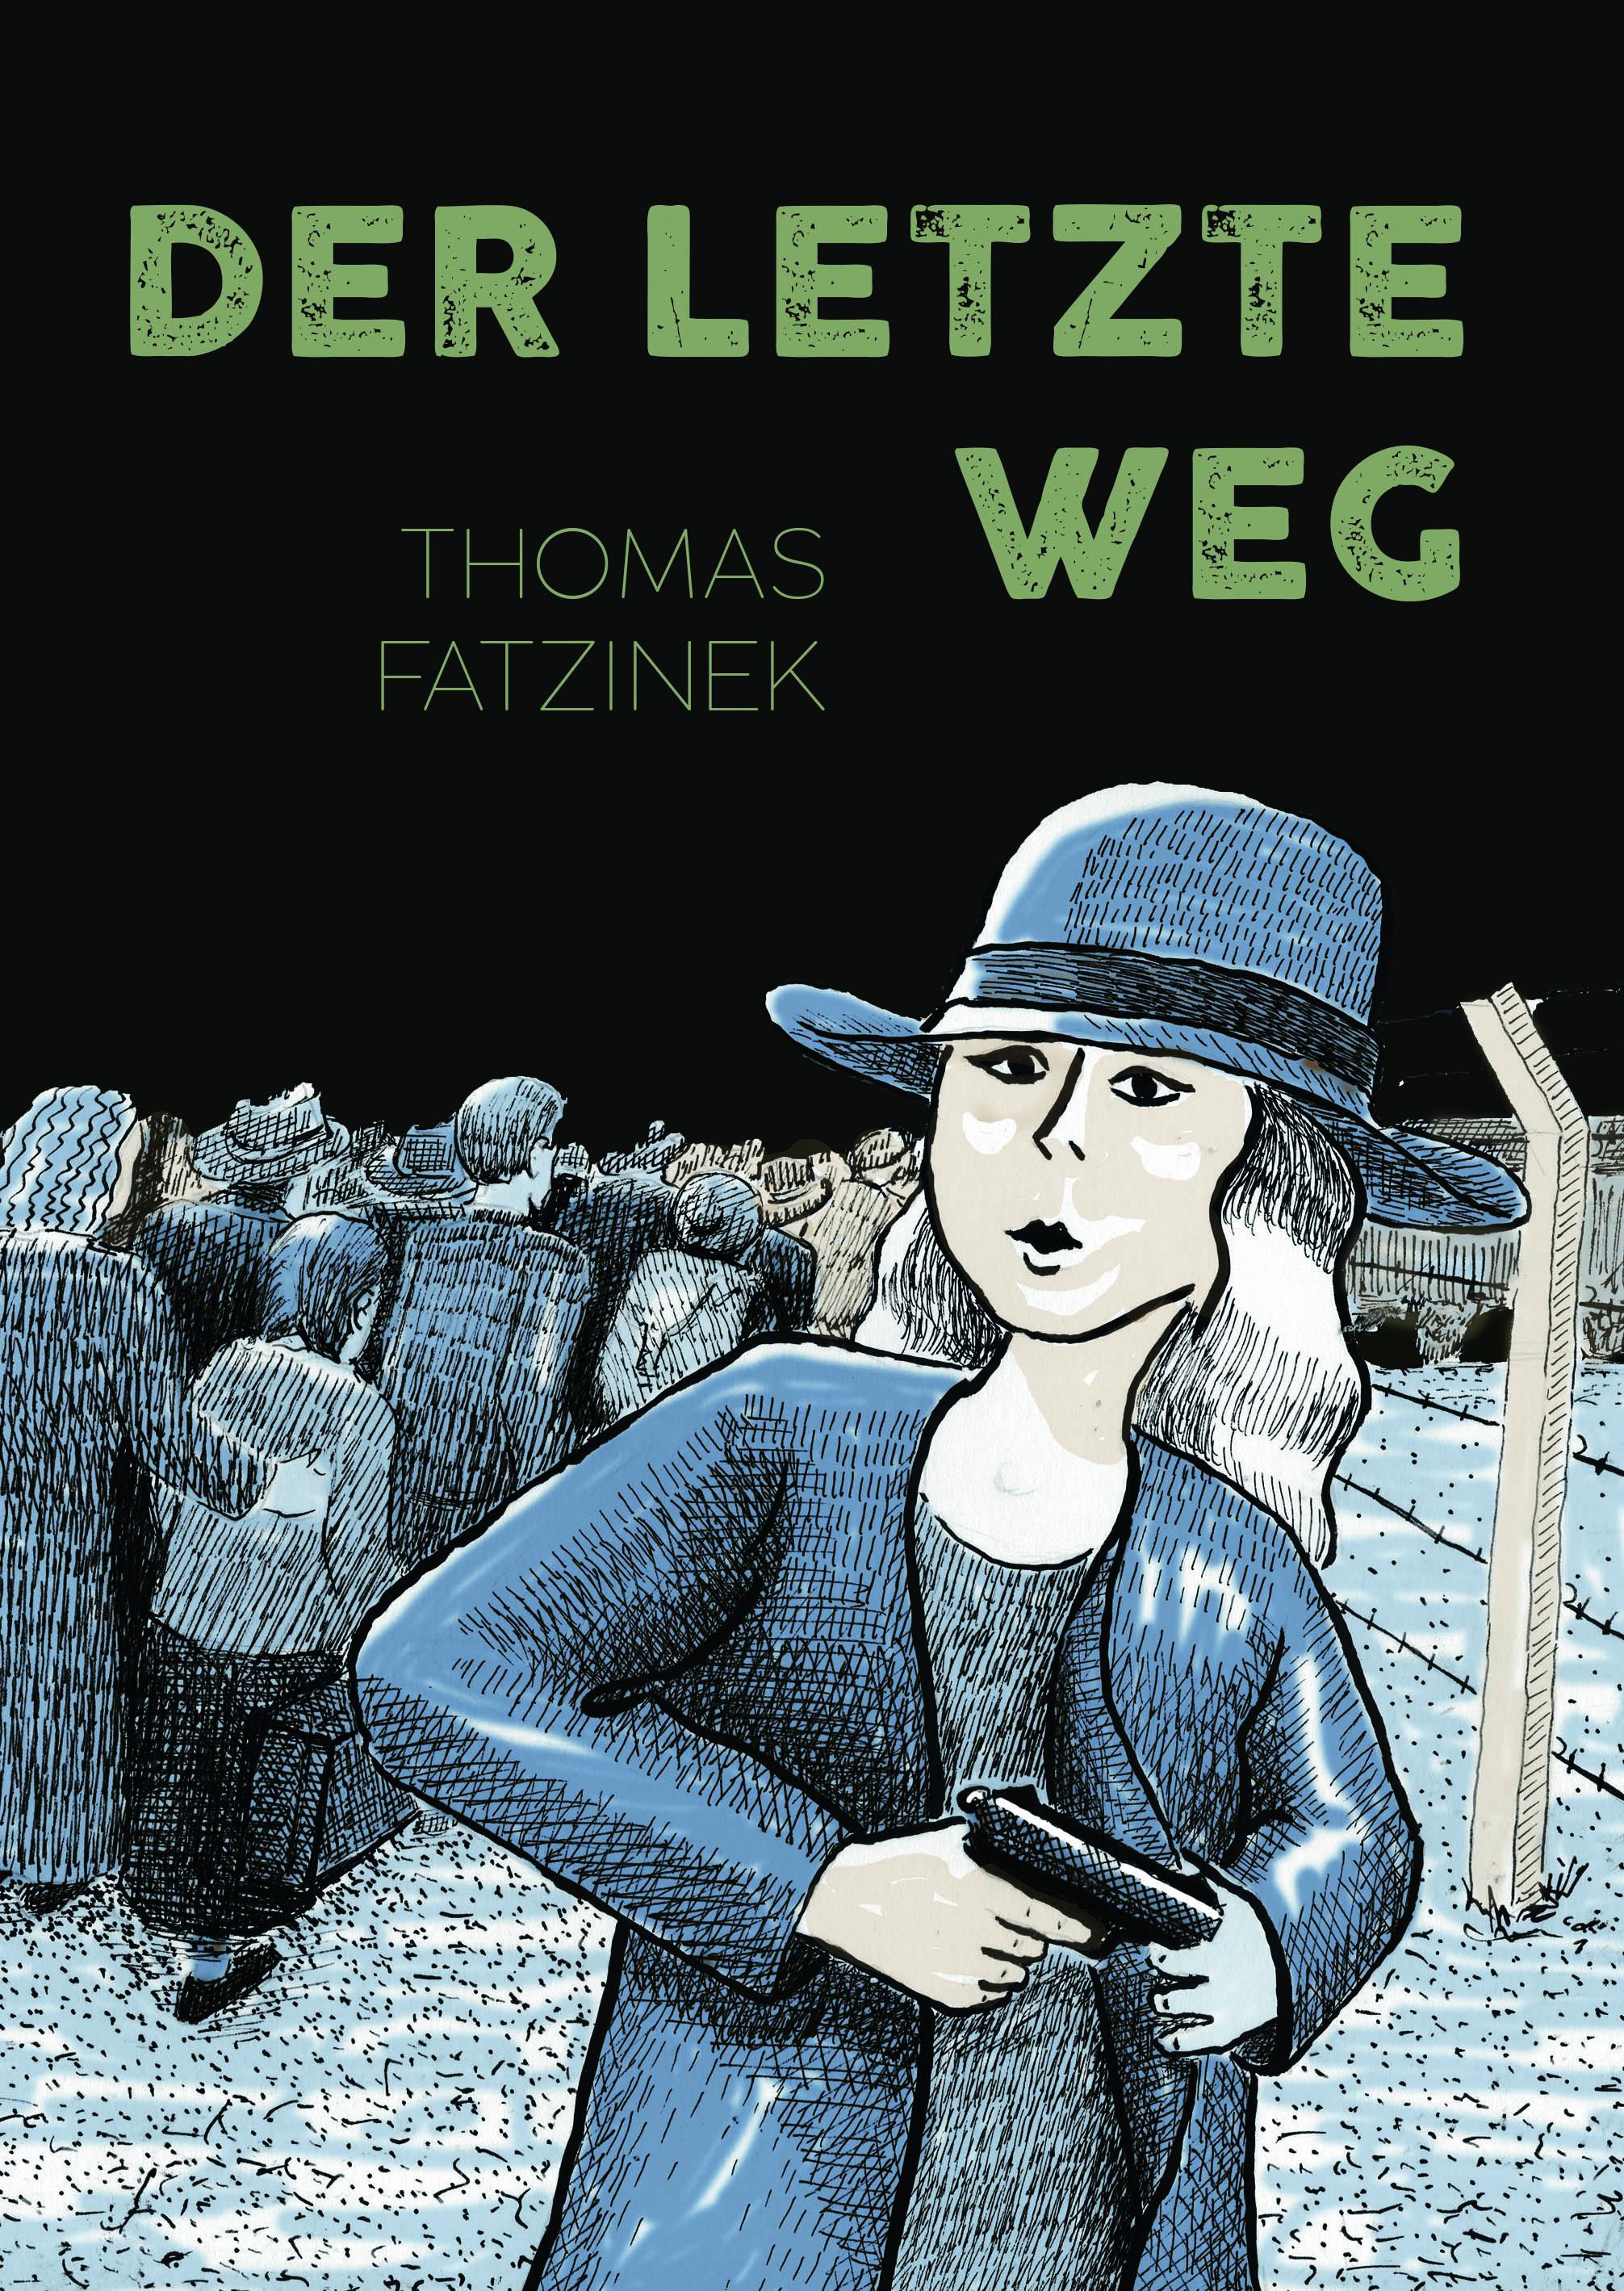 "Thomas Fatzinek, ""Der letzte Weg"", bahoe books"